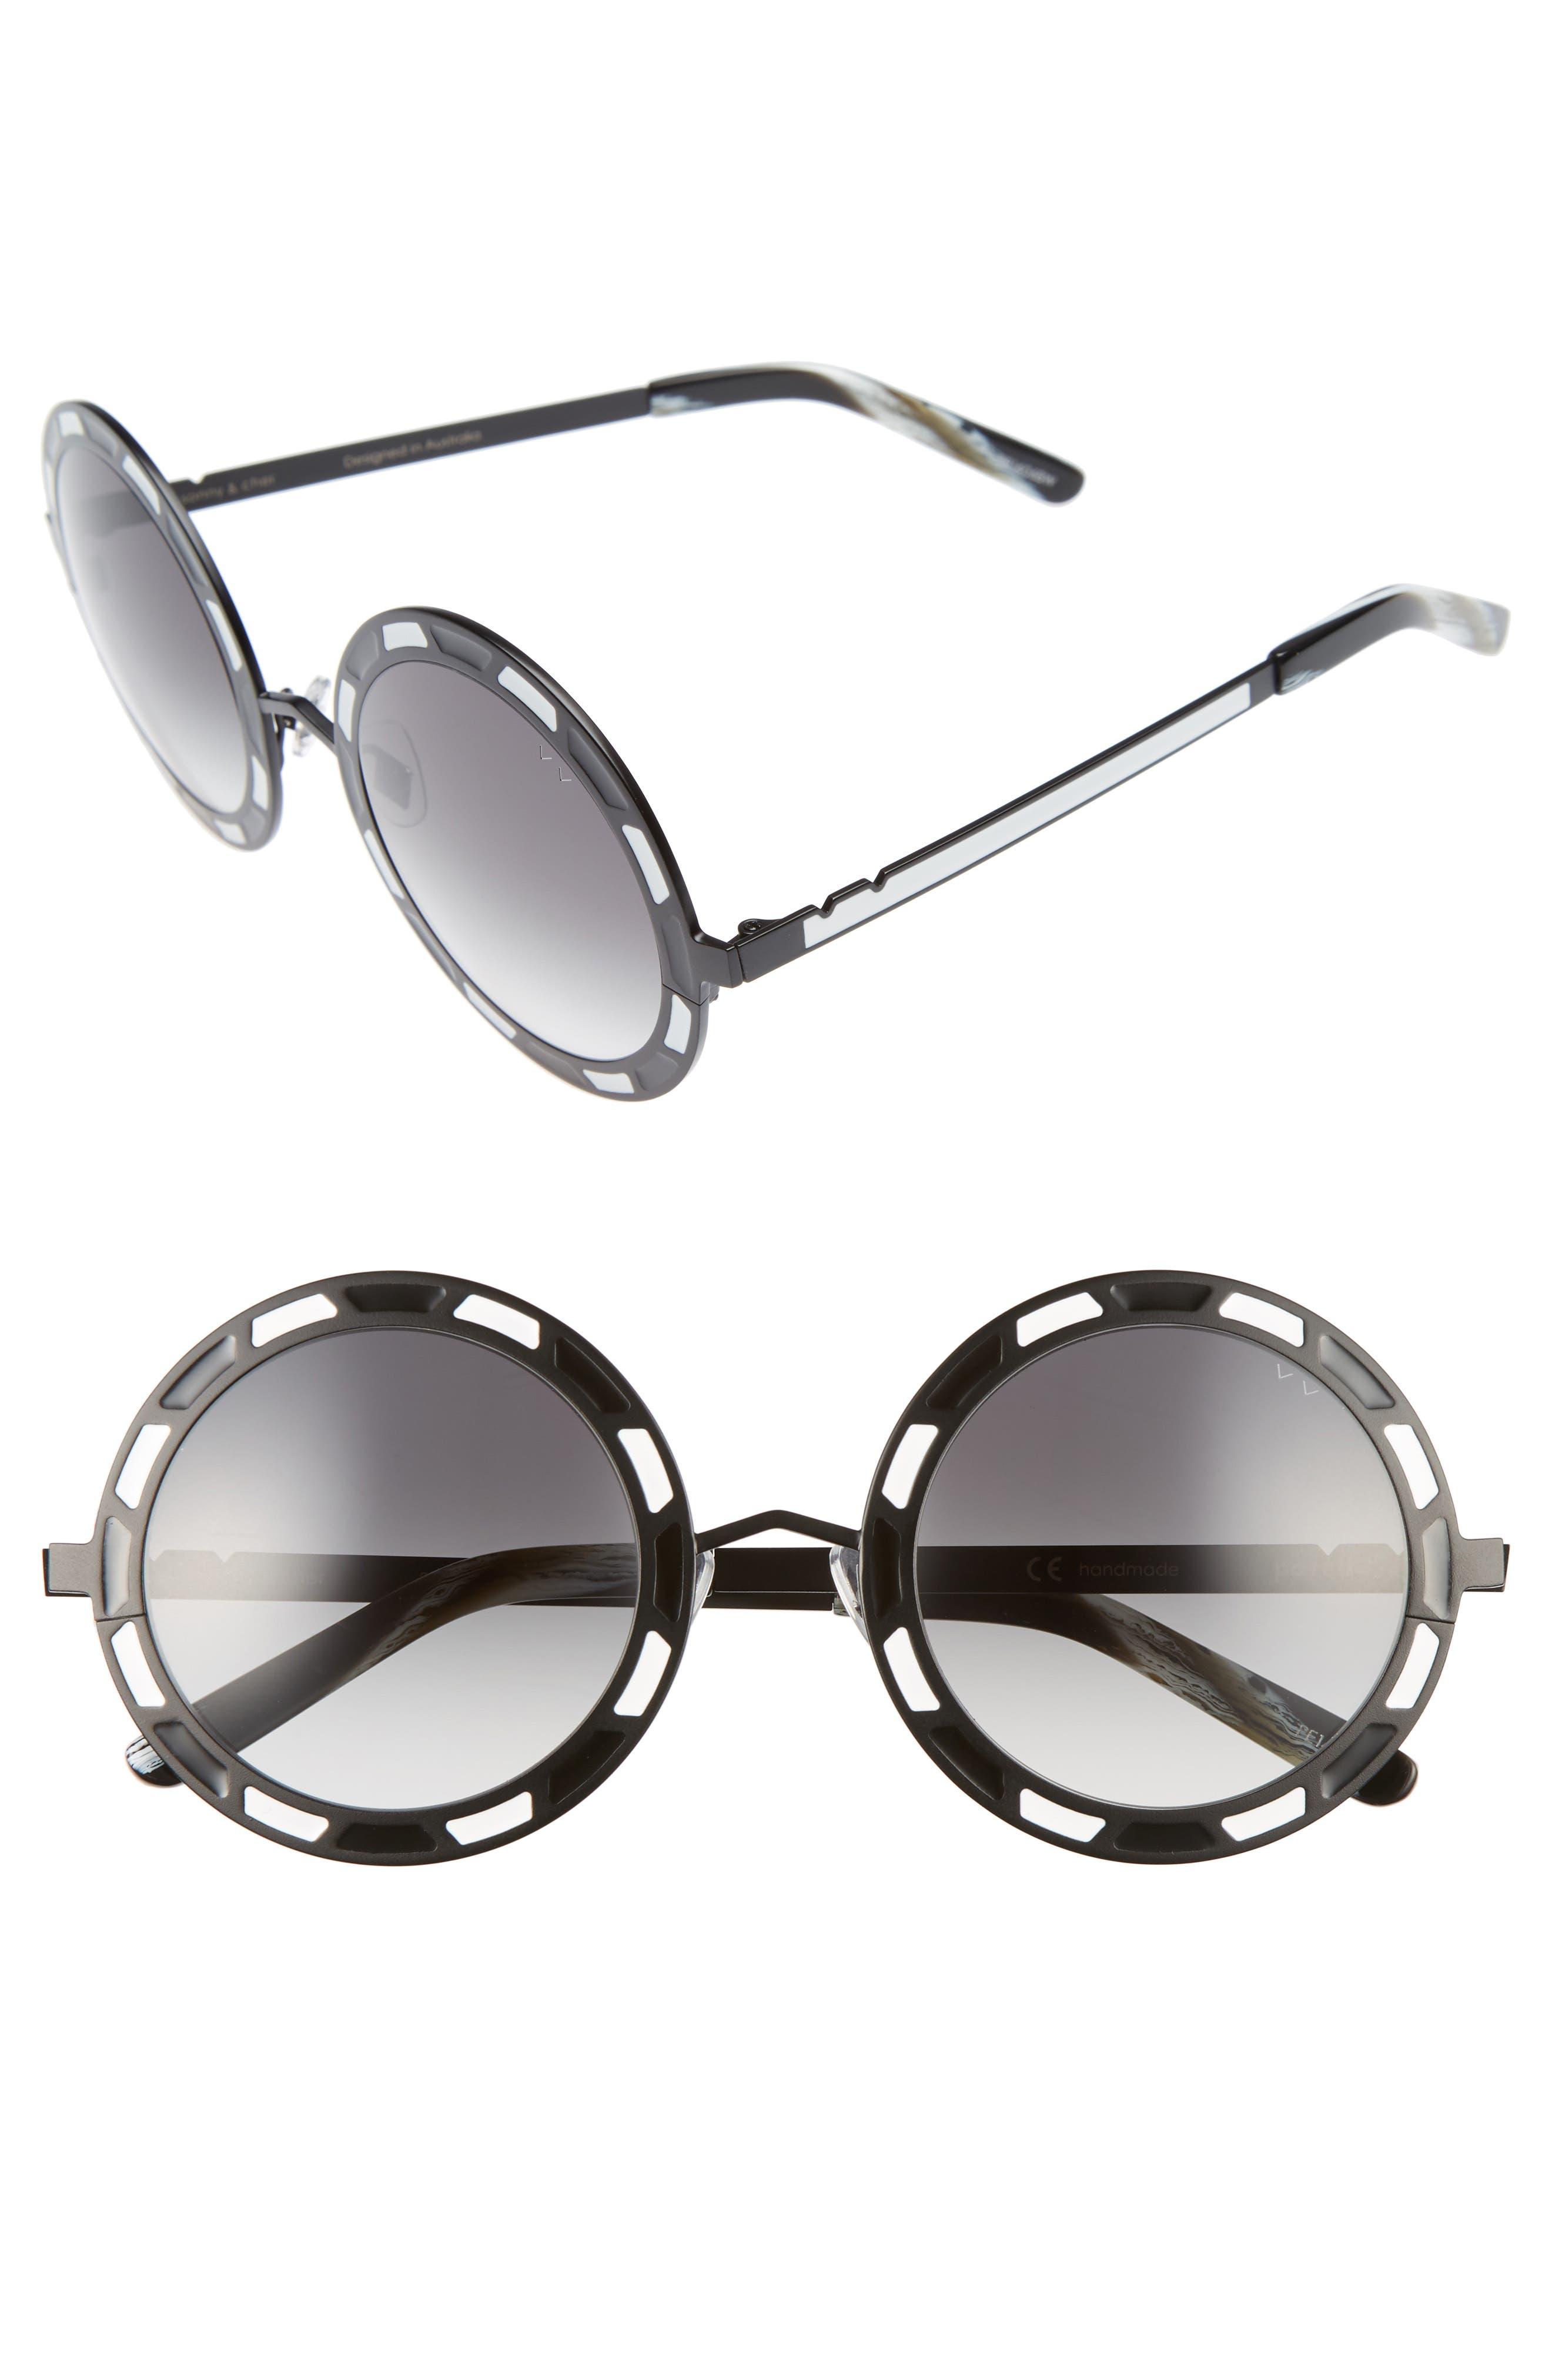 Sonny & Cher 50mm Round Sunglasses,                         Main,                         color, Black Titanium/ White Grey